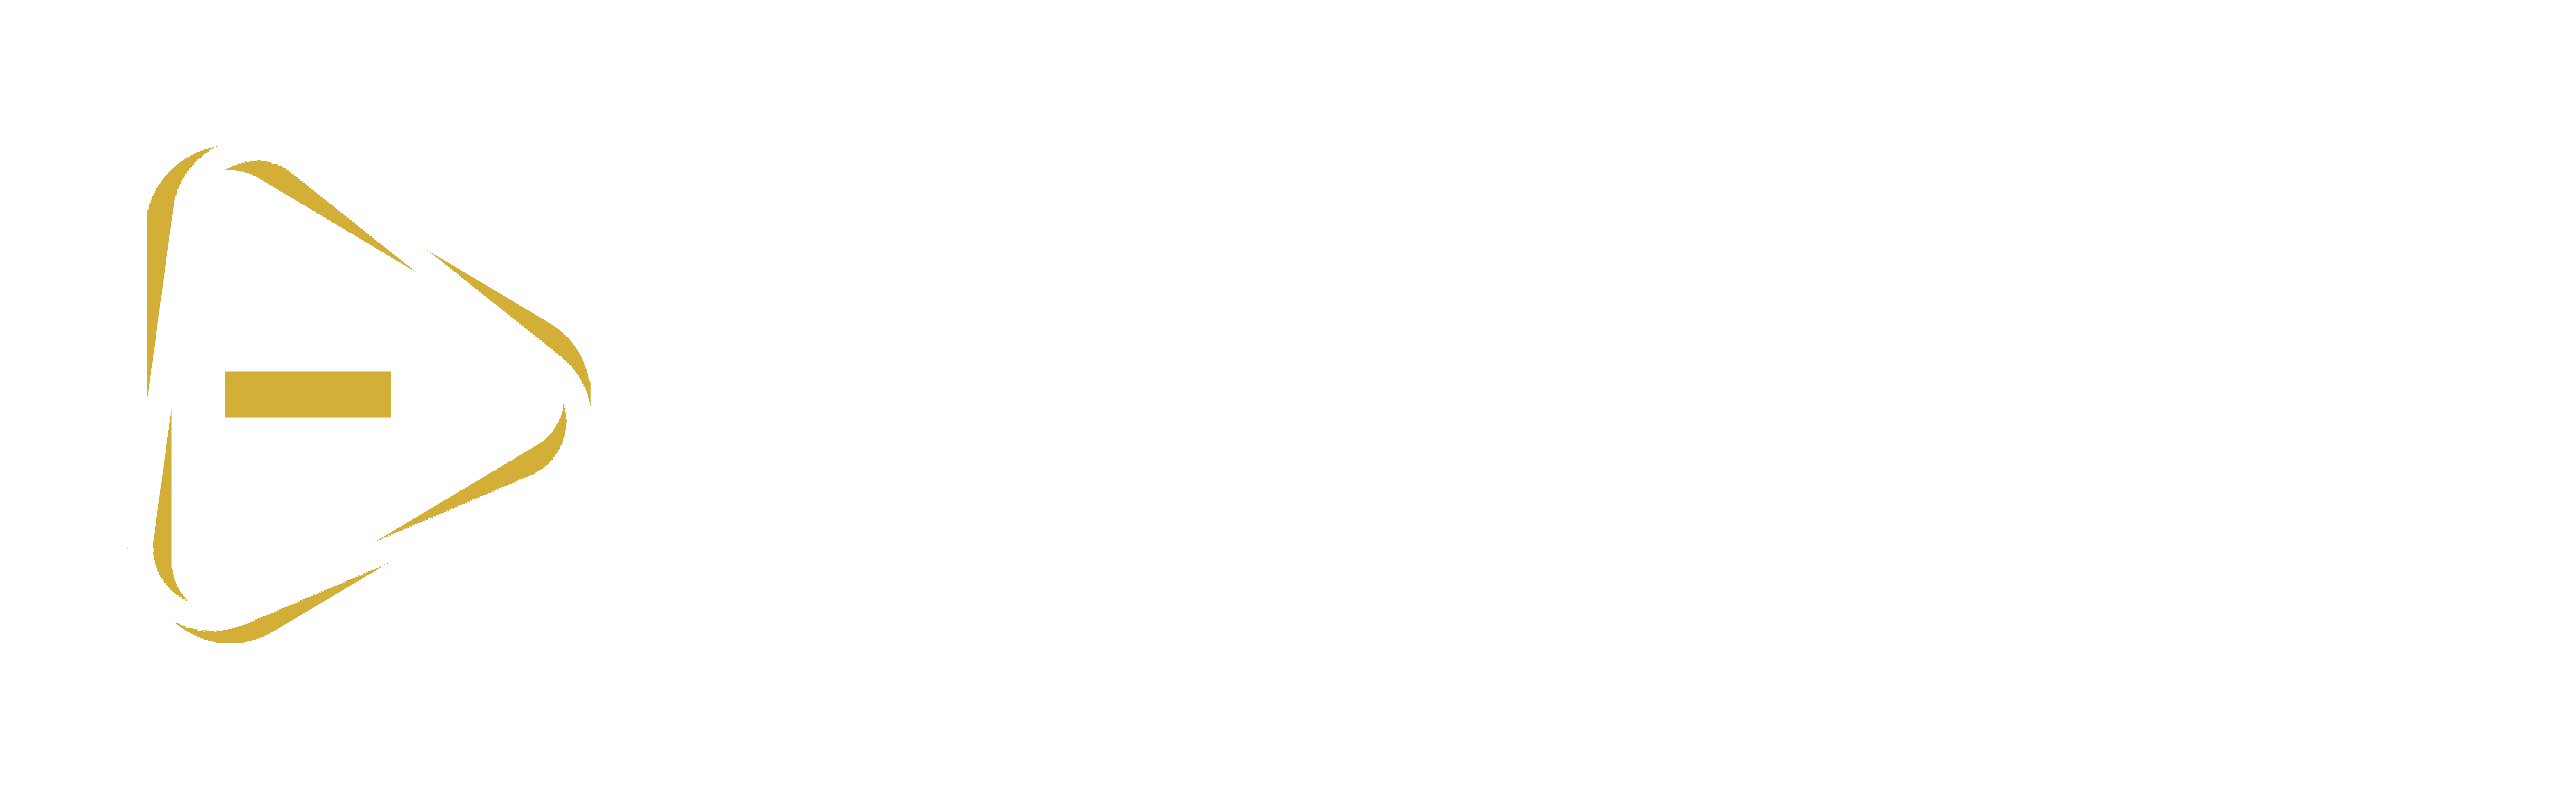 Immense Média